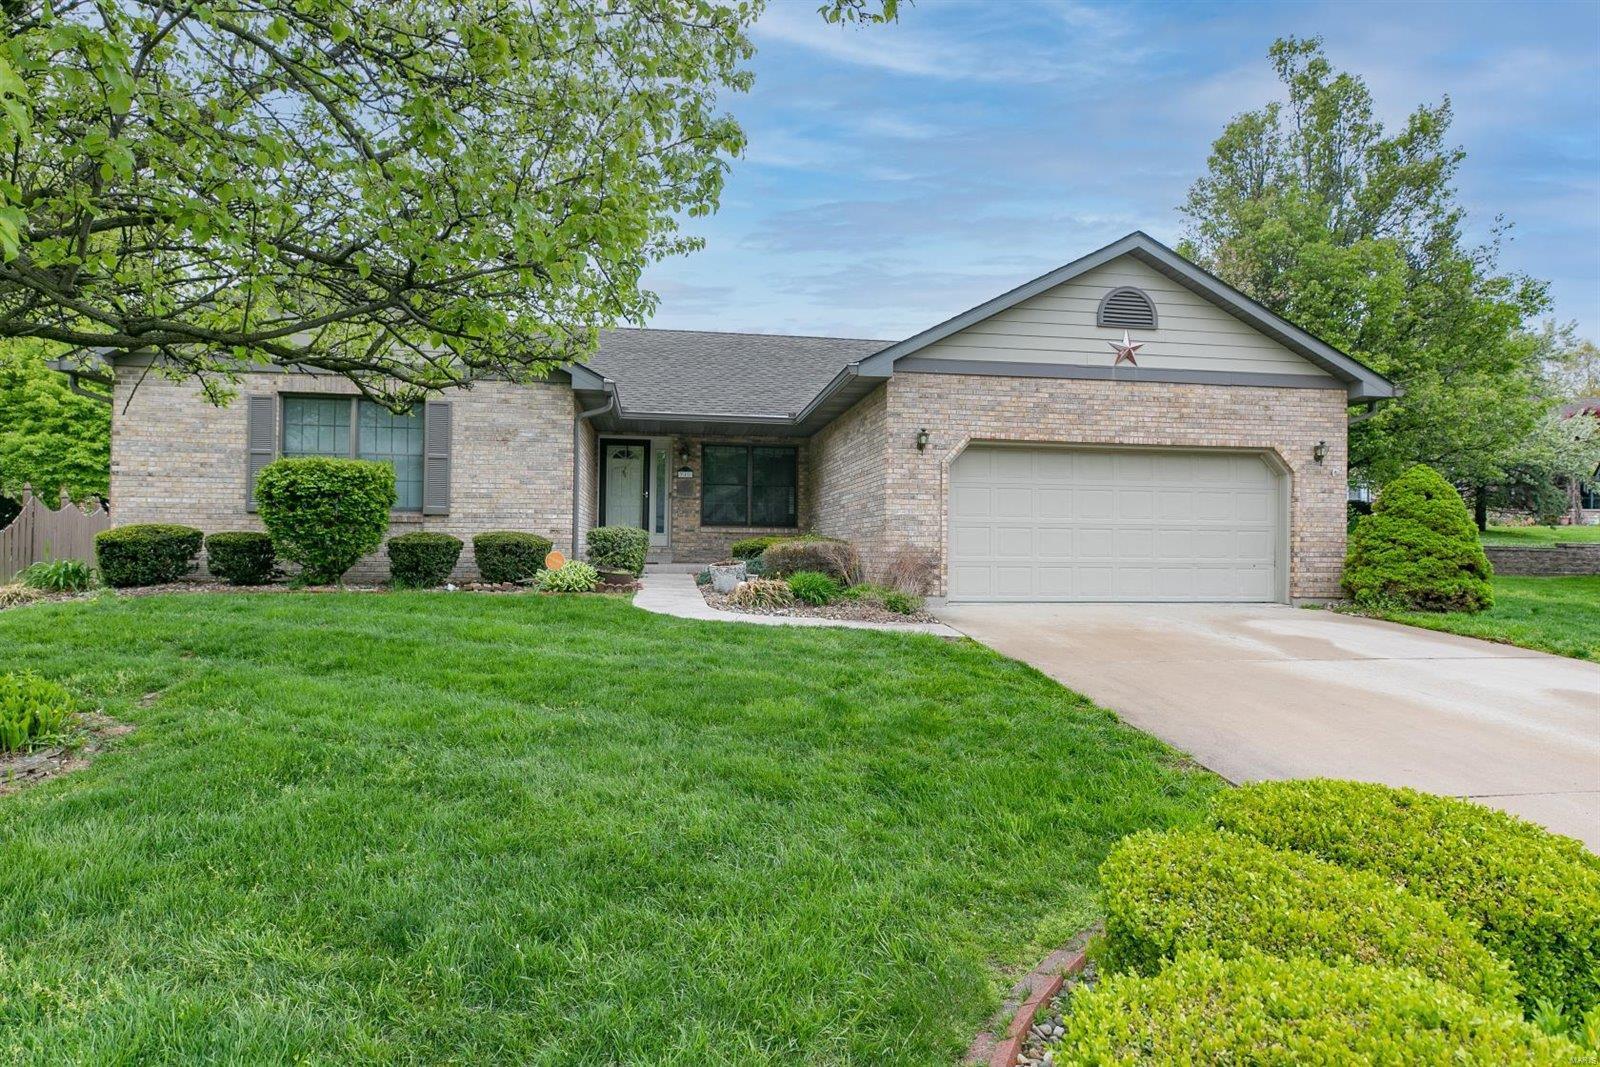 311 Hickory Bend Property Photo - Belleville, IL real estate listing